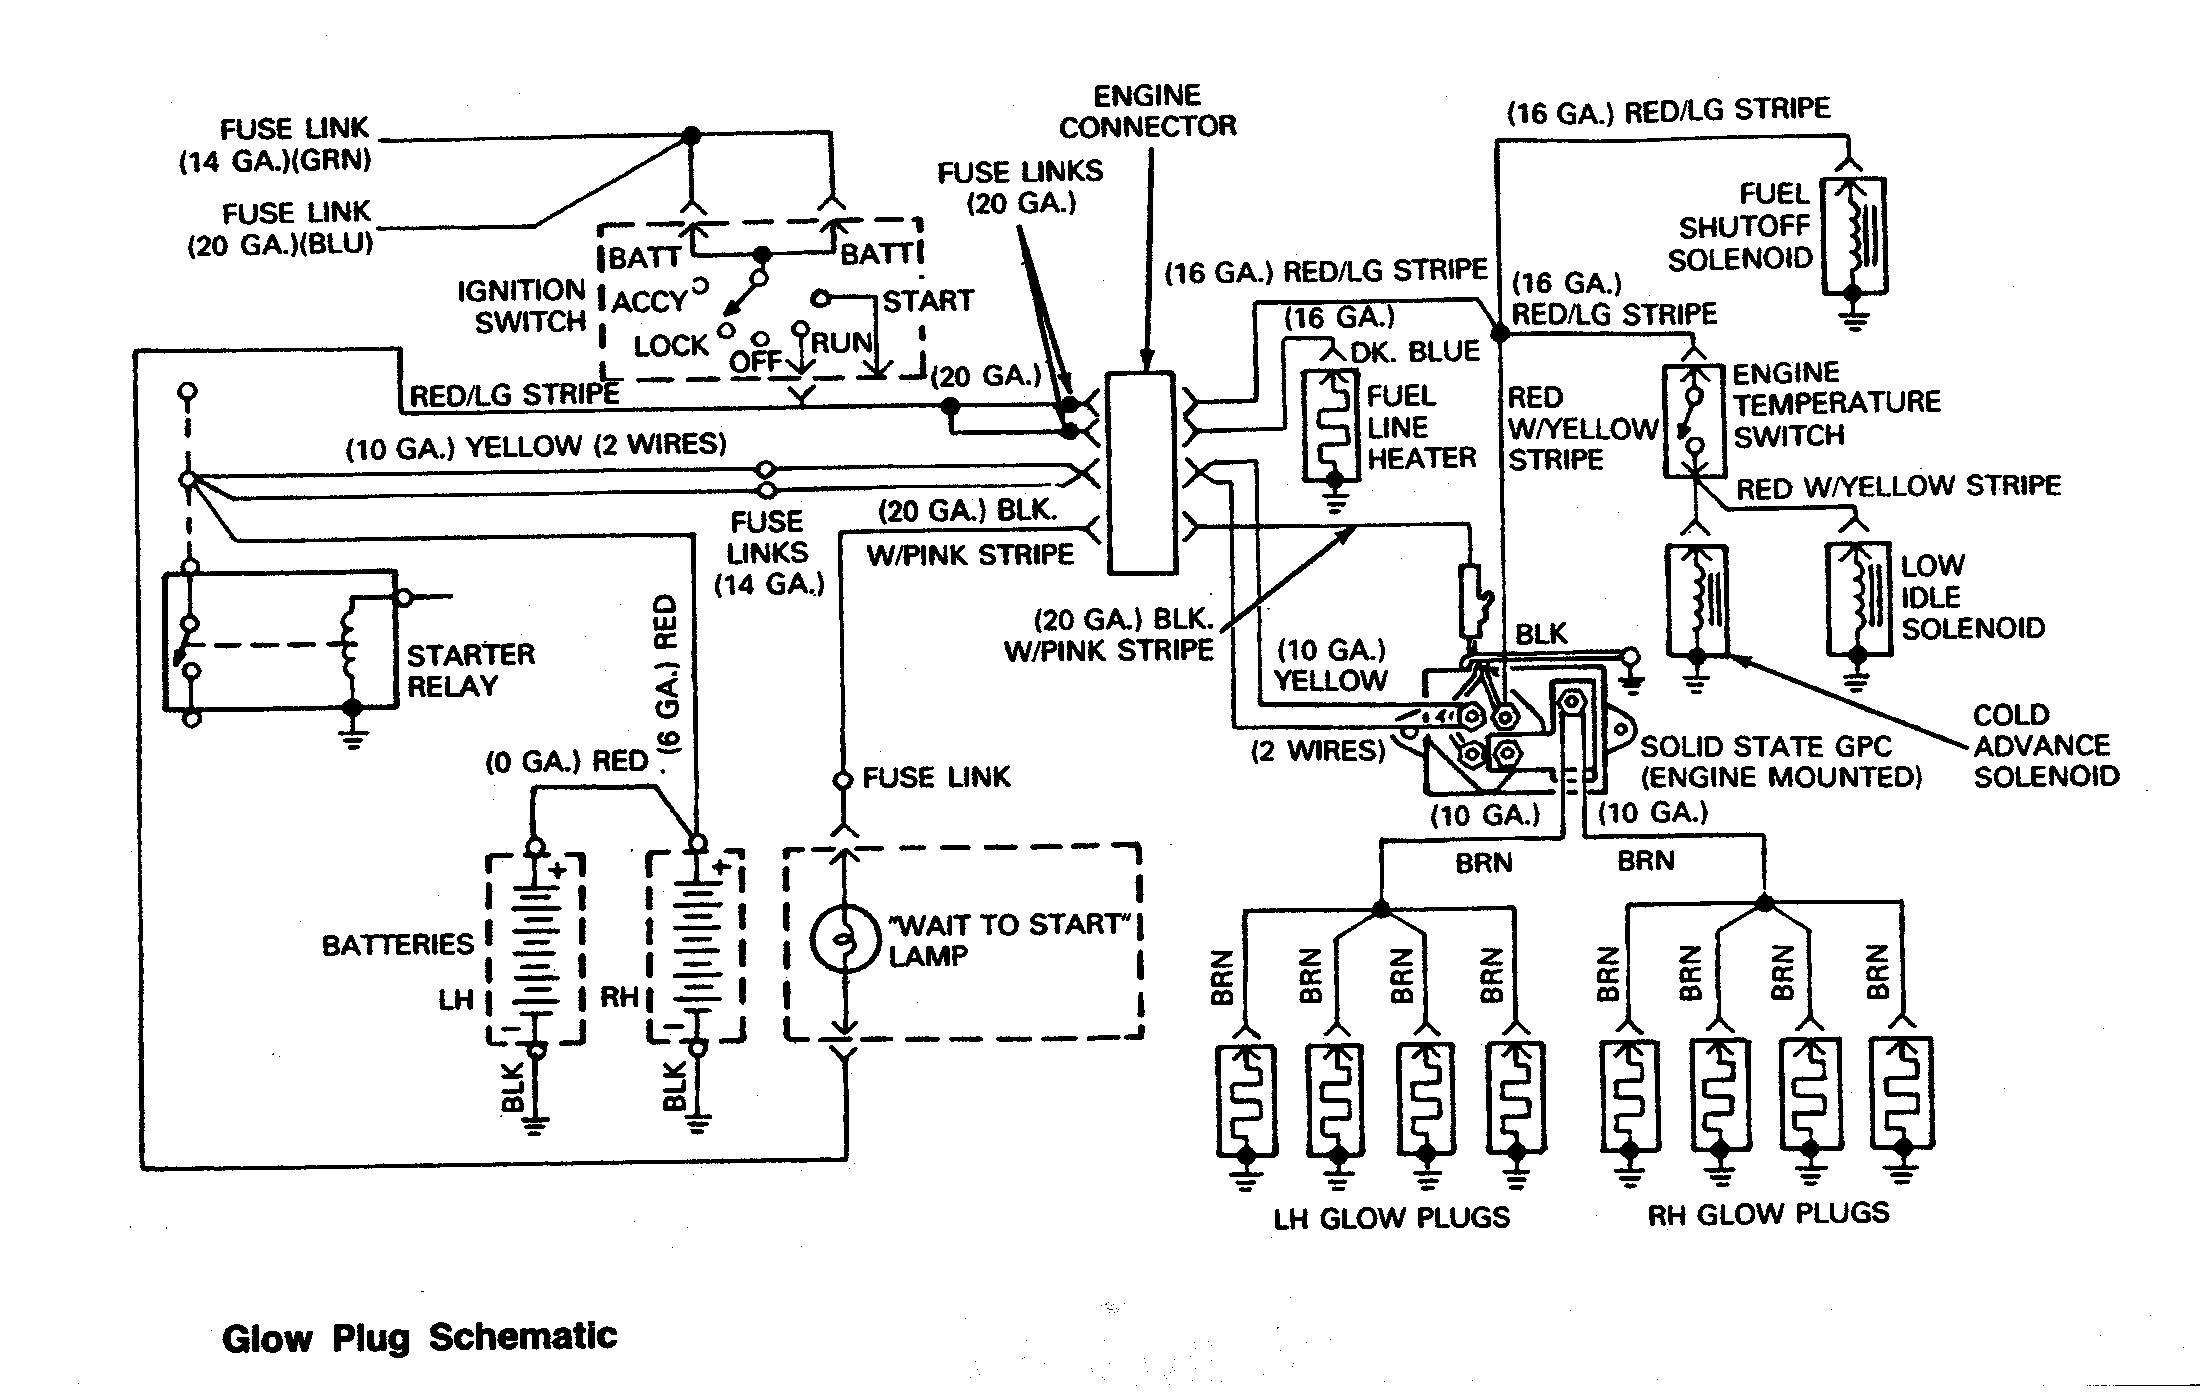 Wiring Diagram Cars Trucks Engine tune, Diagram, Trailer